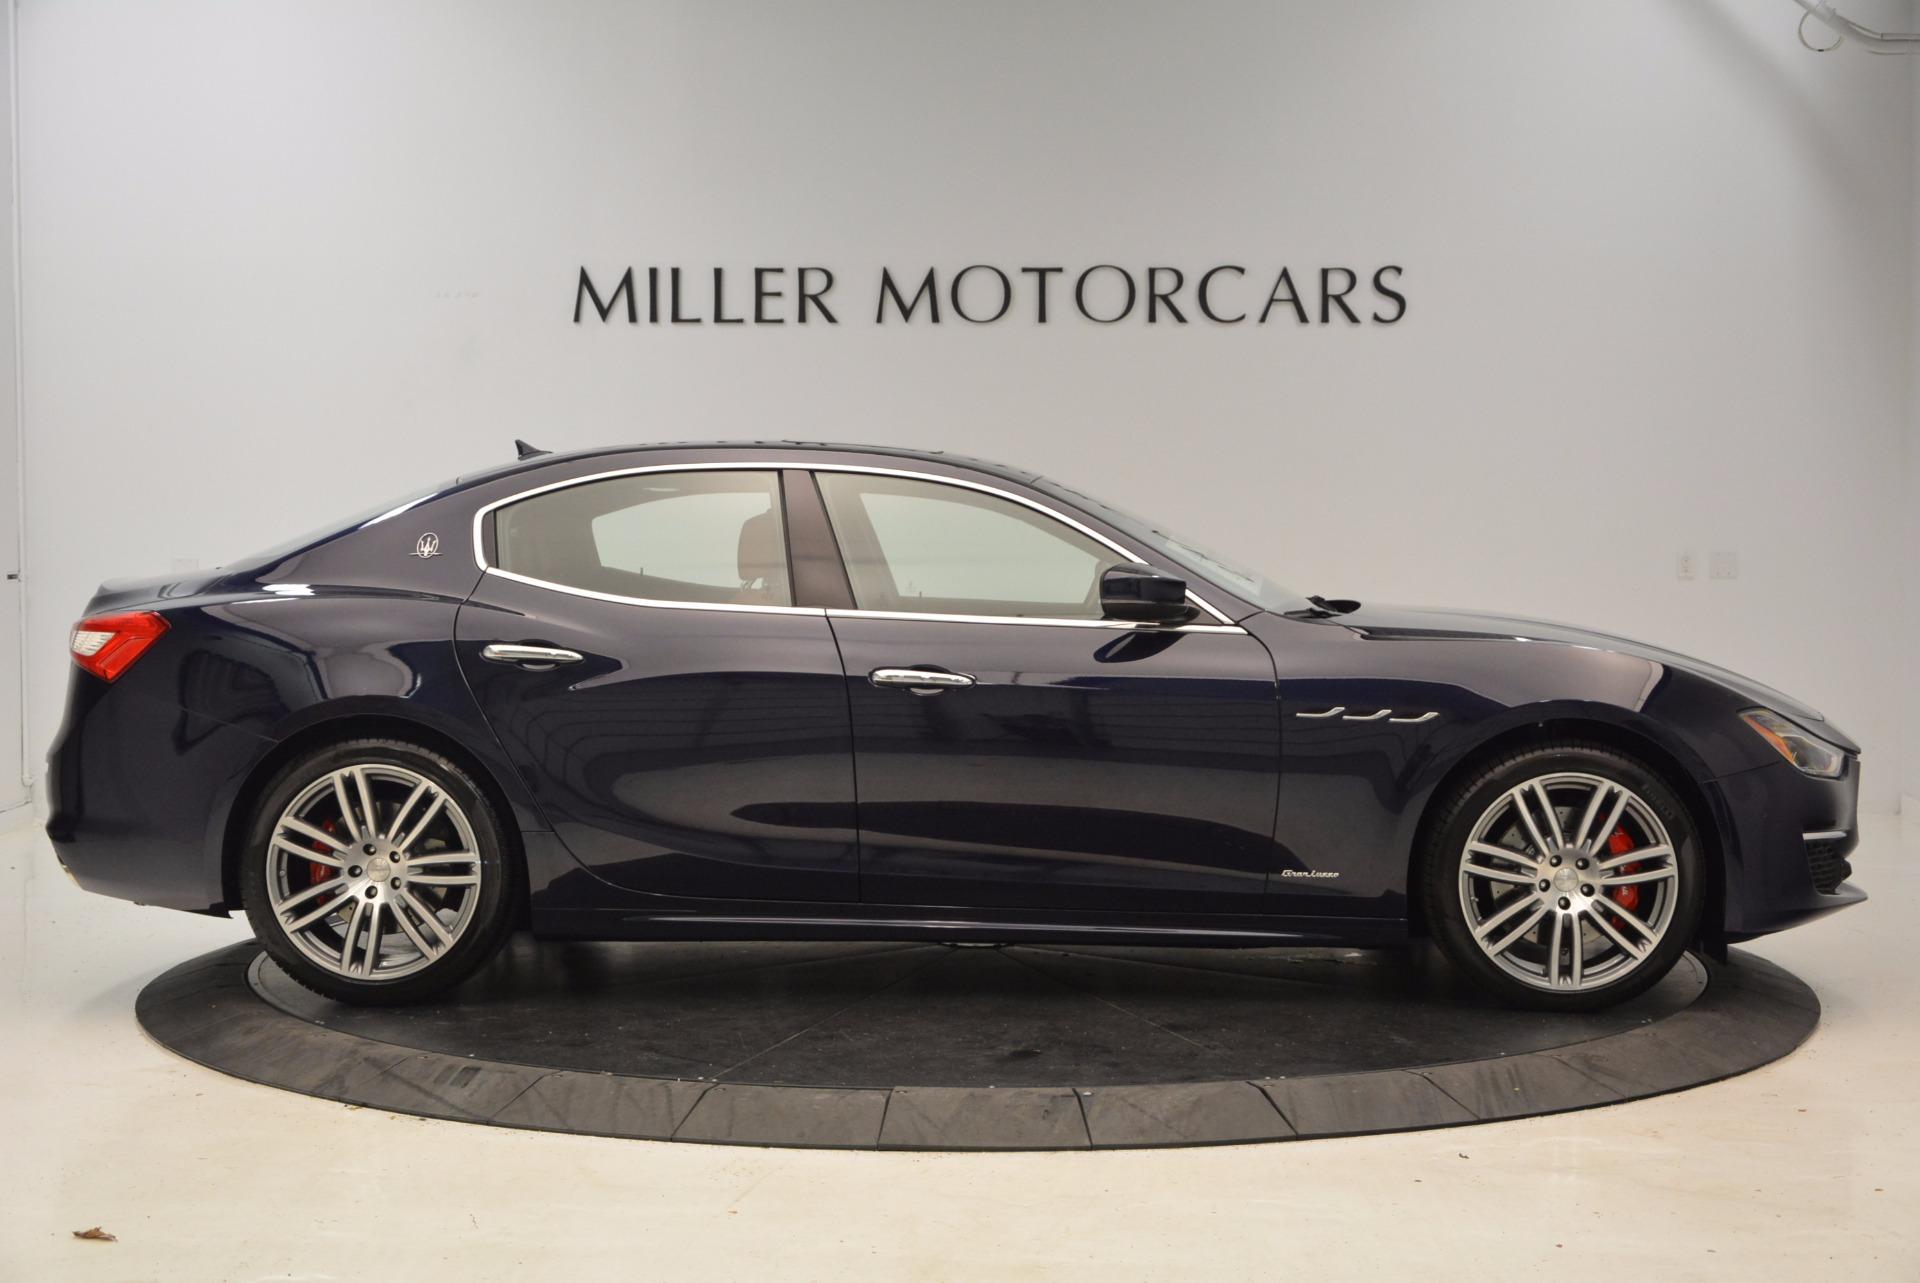 New 2018 Maserati Ghibli S Q4 GranLusso